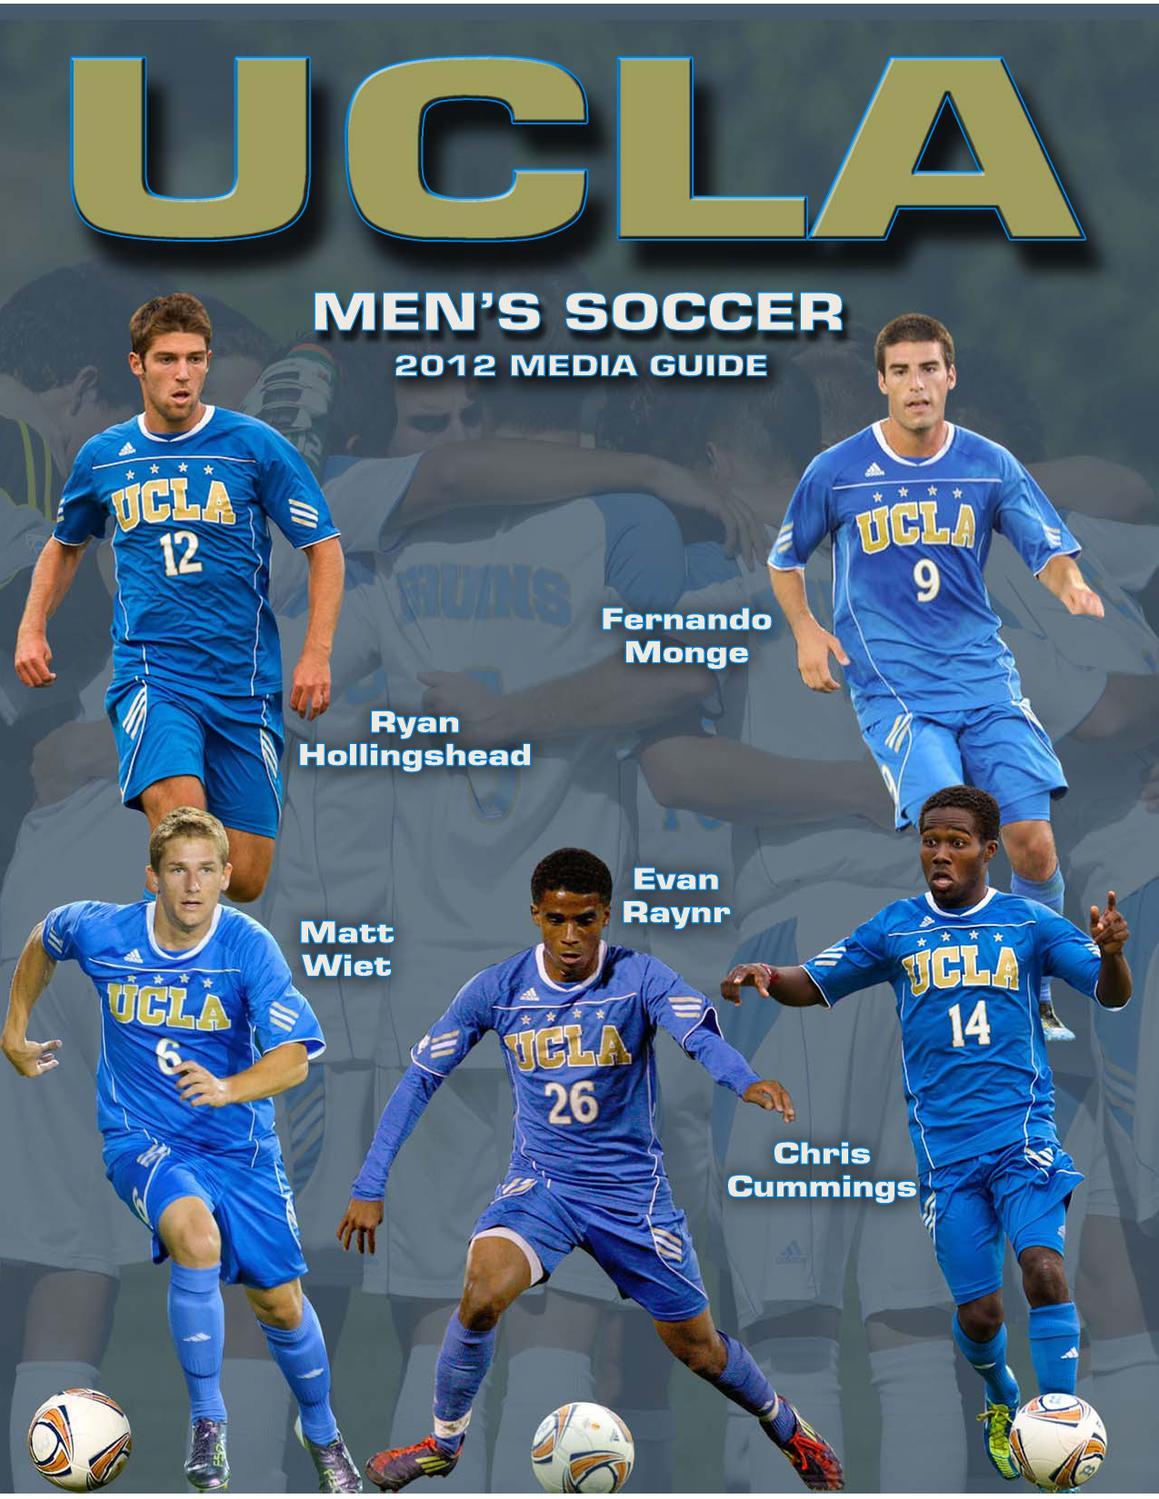 finest selection 4e2e7 23b7a 2012 UCLA Men's Soccer Media Guide by UCLA Athletics - issuu